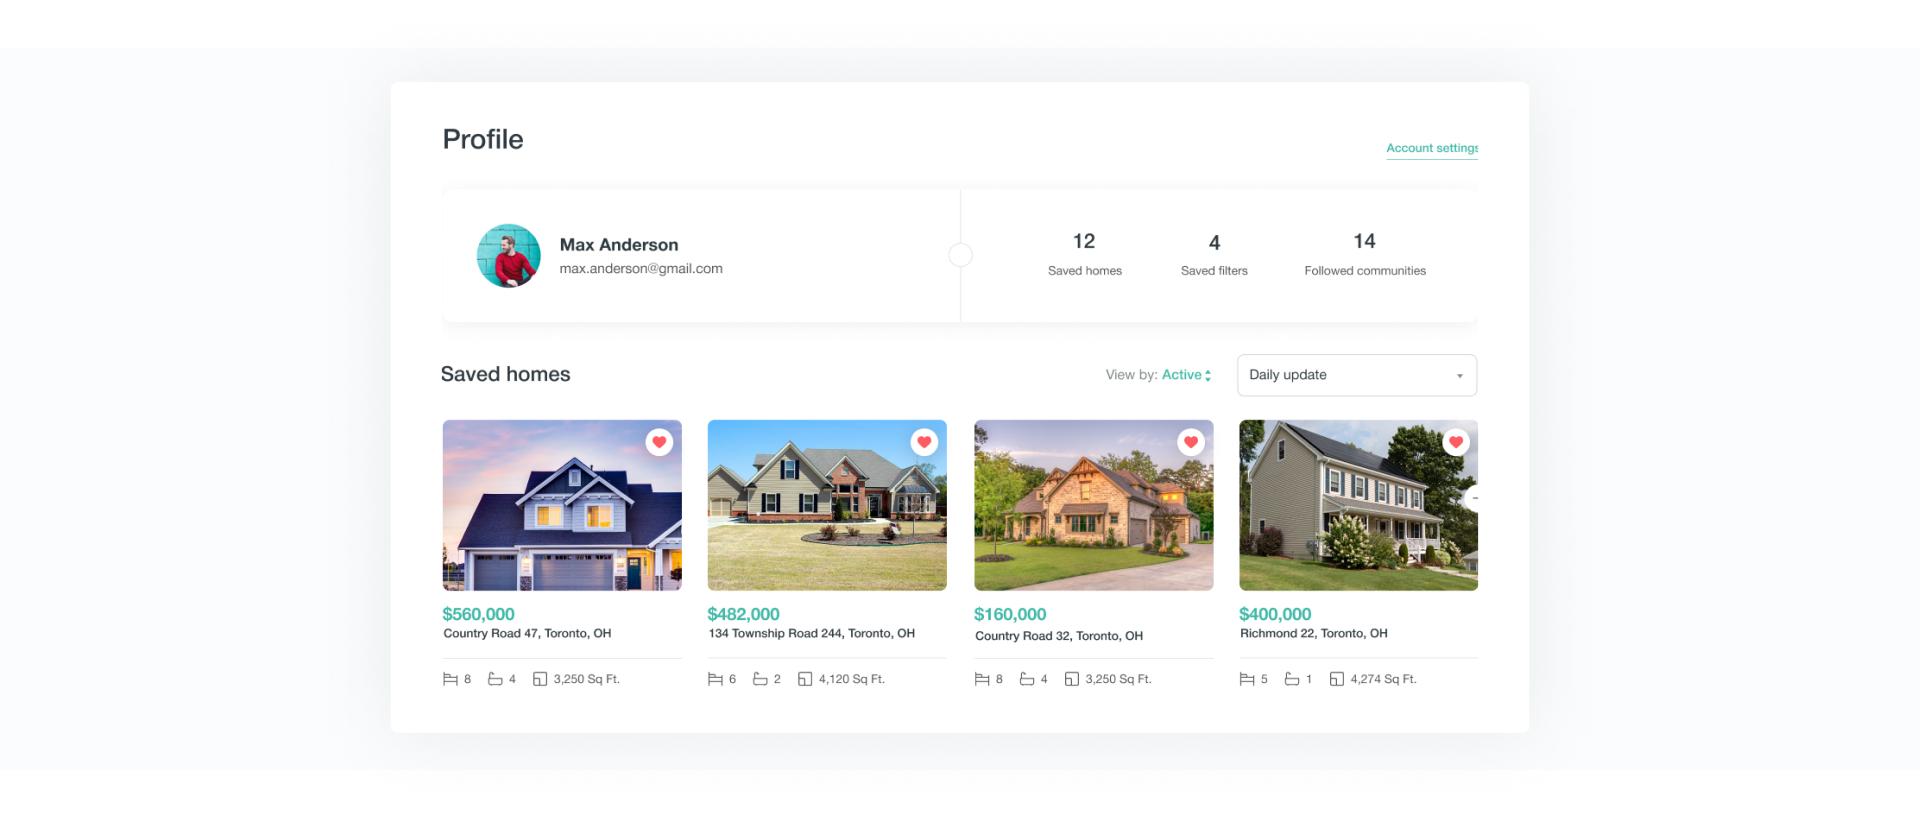 Marketplace user profile